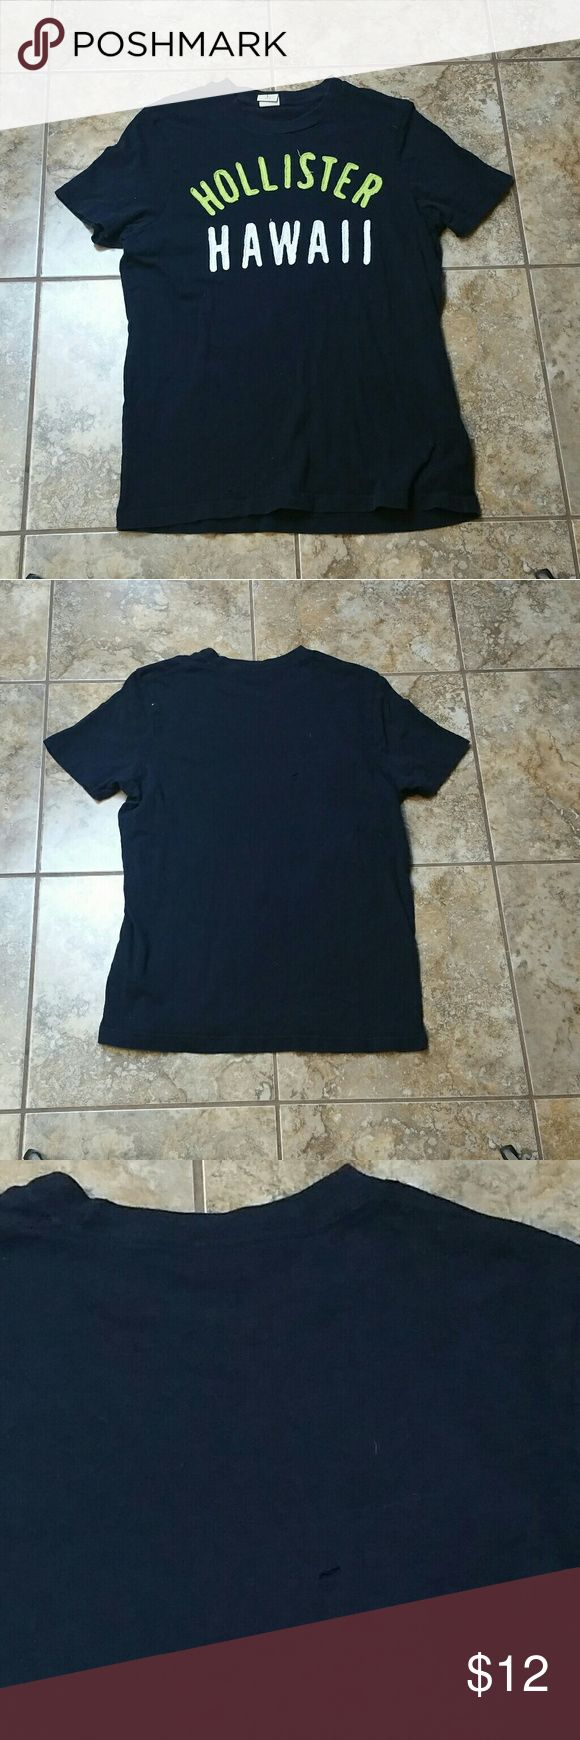 Black t shirts hollister - Hollister Hawaii Graphic T Shirt